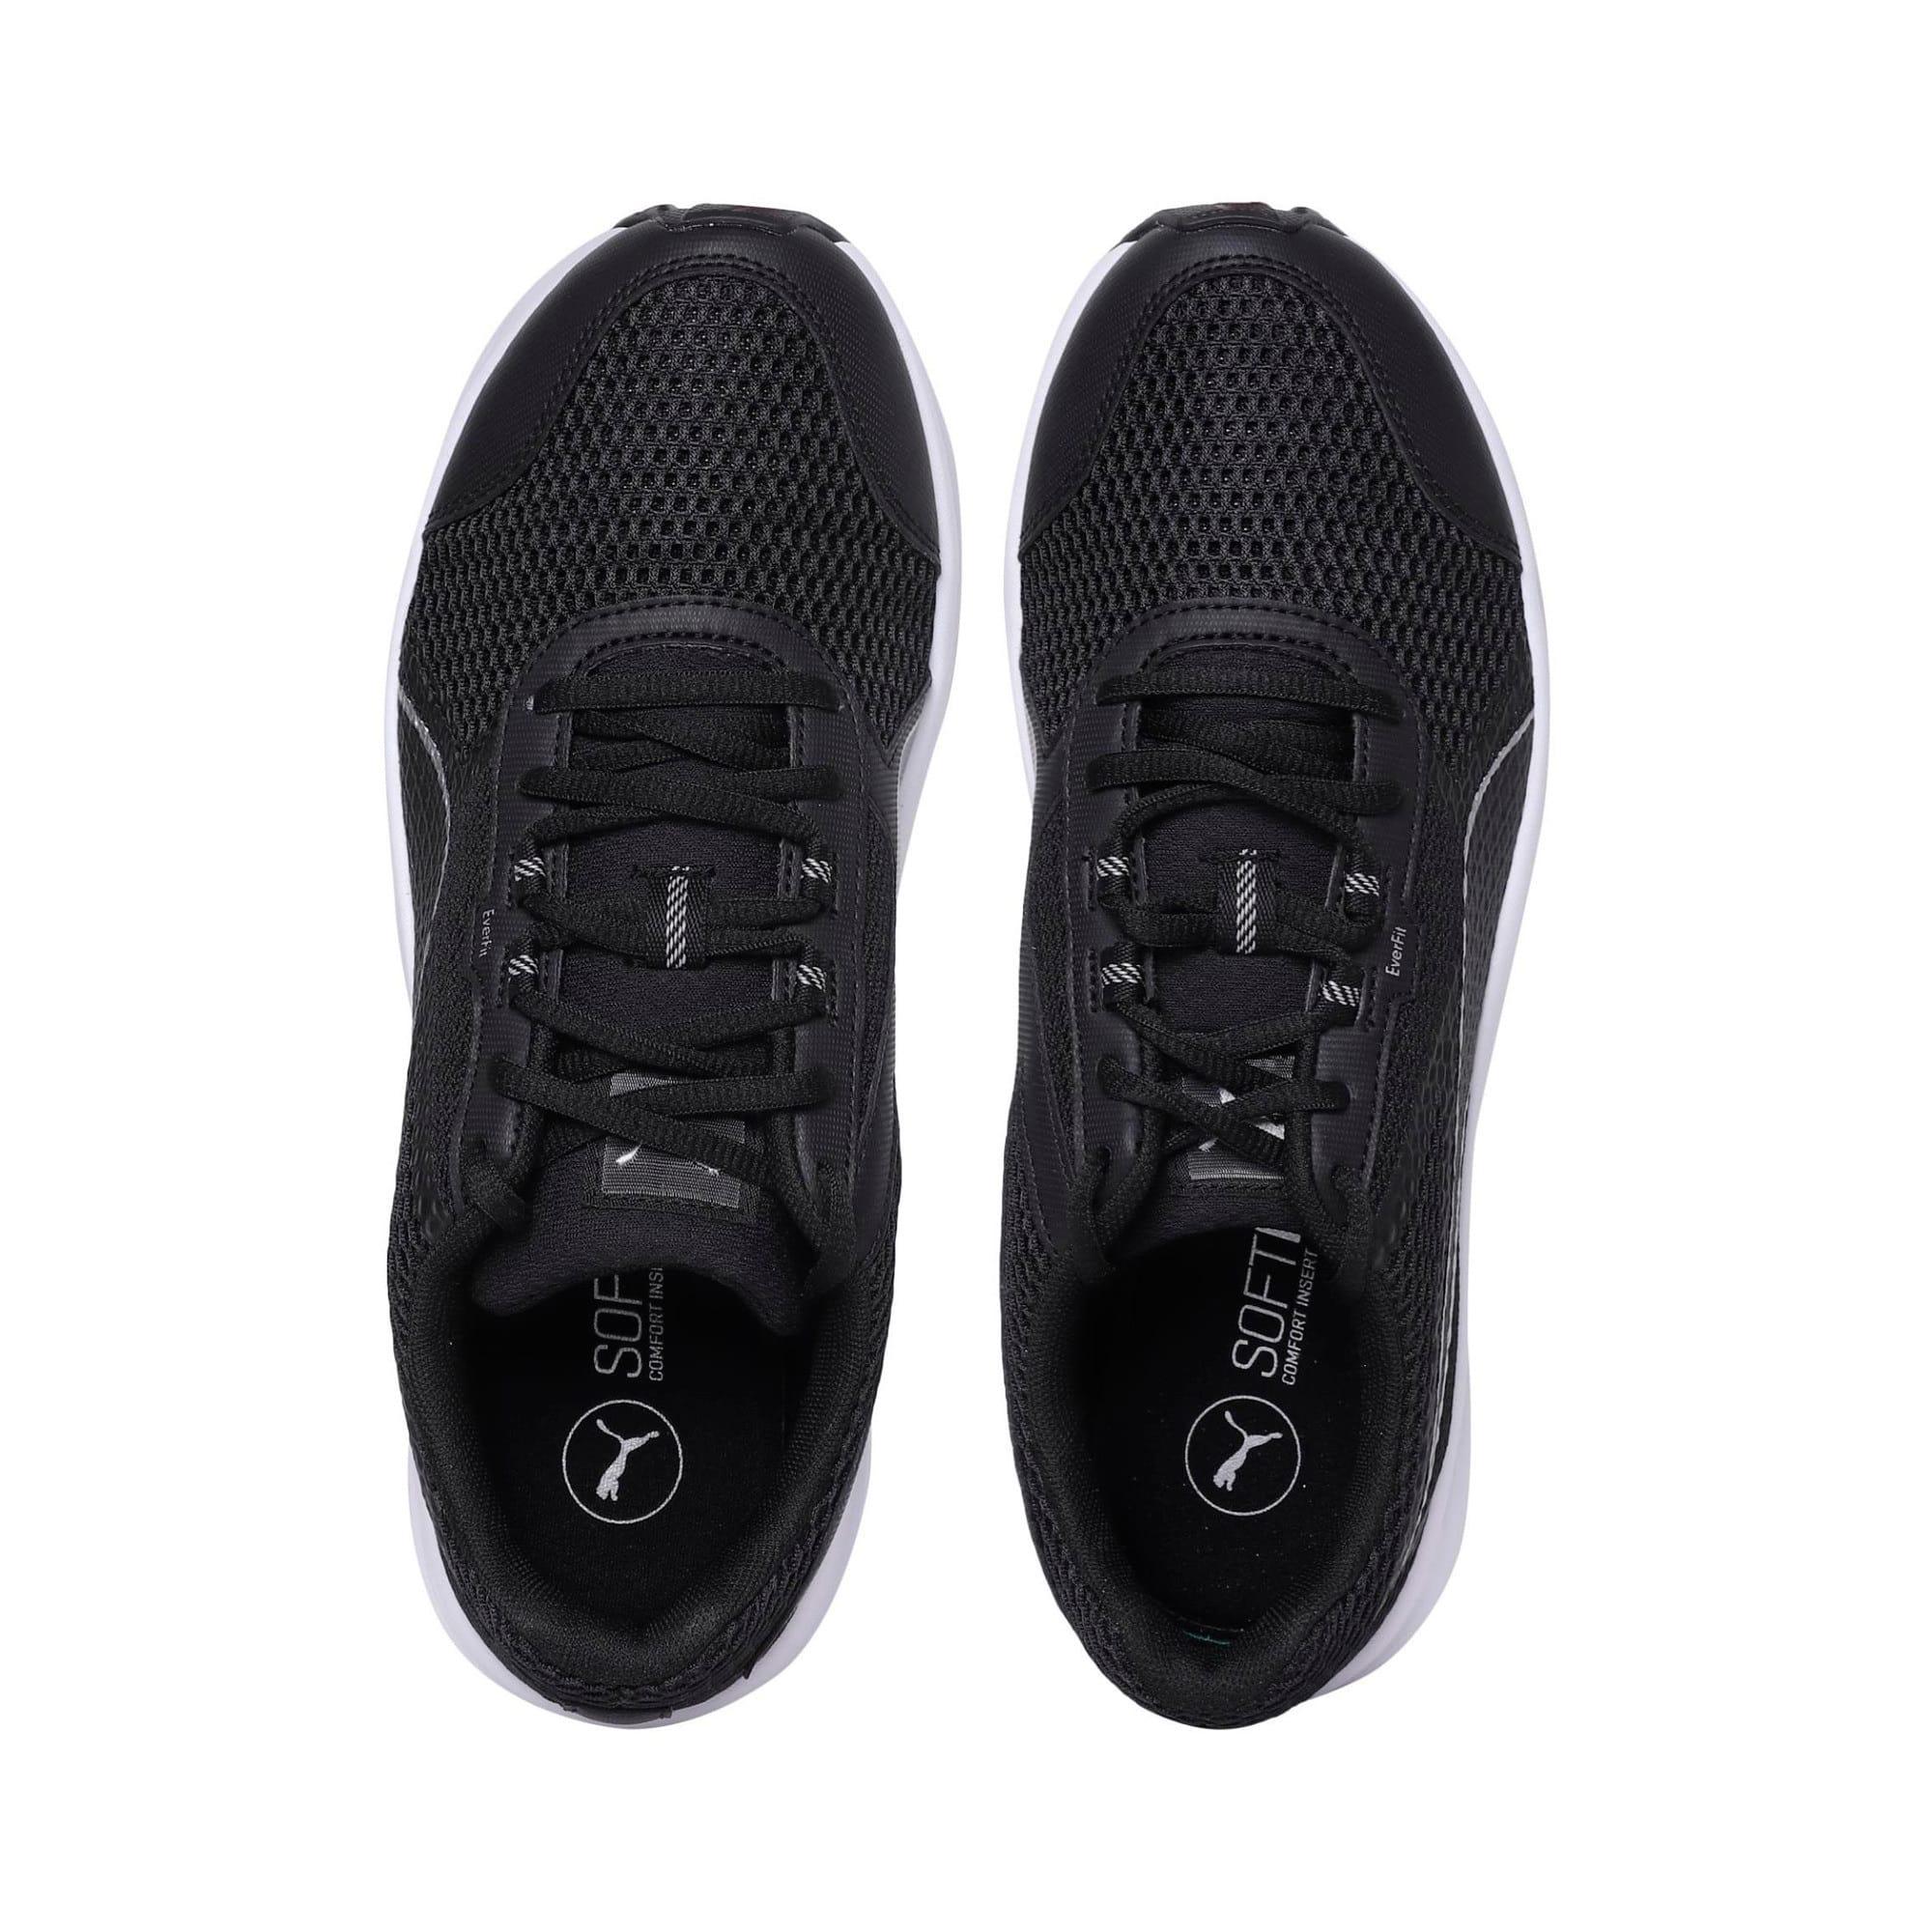 Thumbnail 6 of Essential Runner Men's Running Shoes, Puma Black-Puma Silver, medium-IND